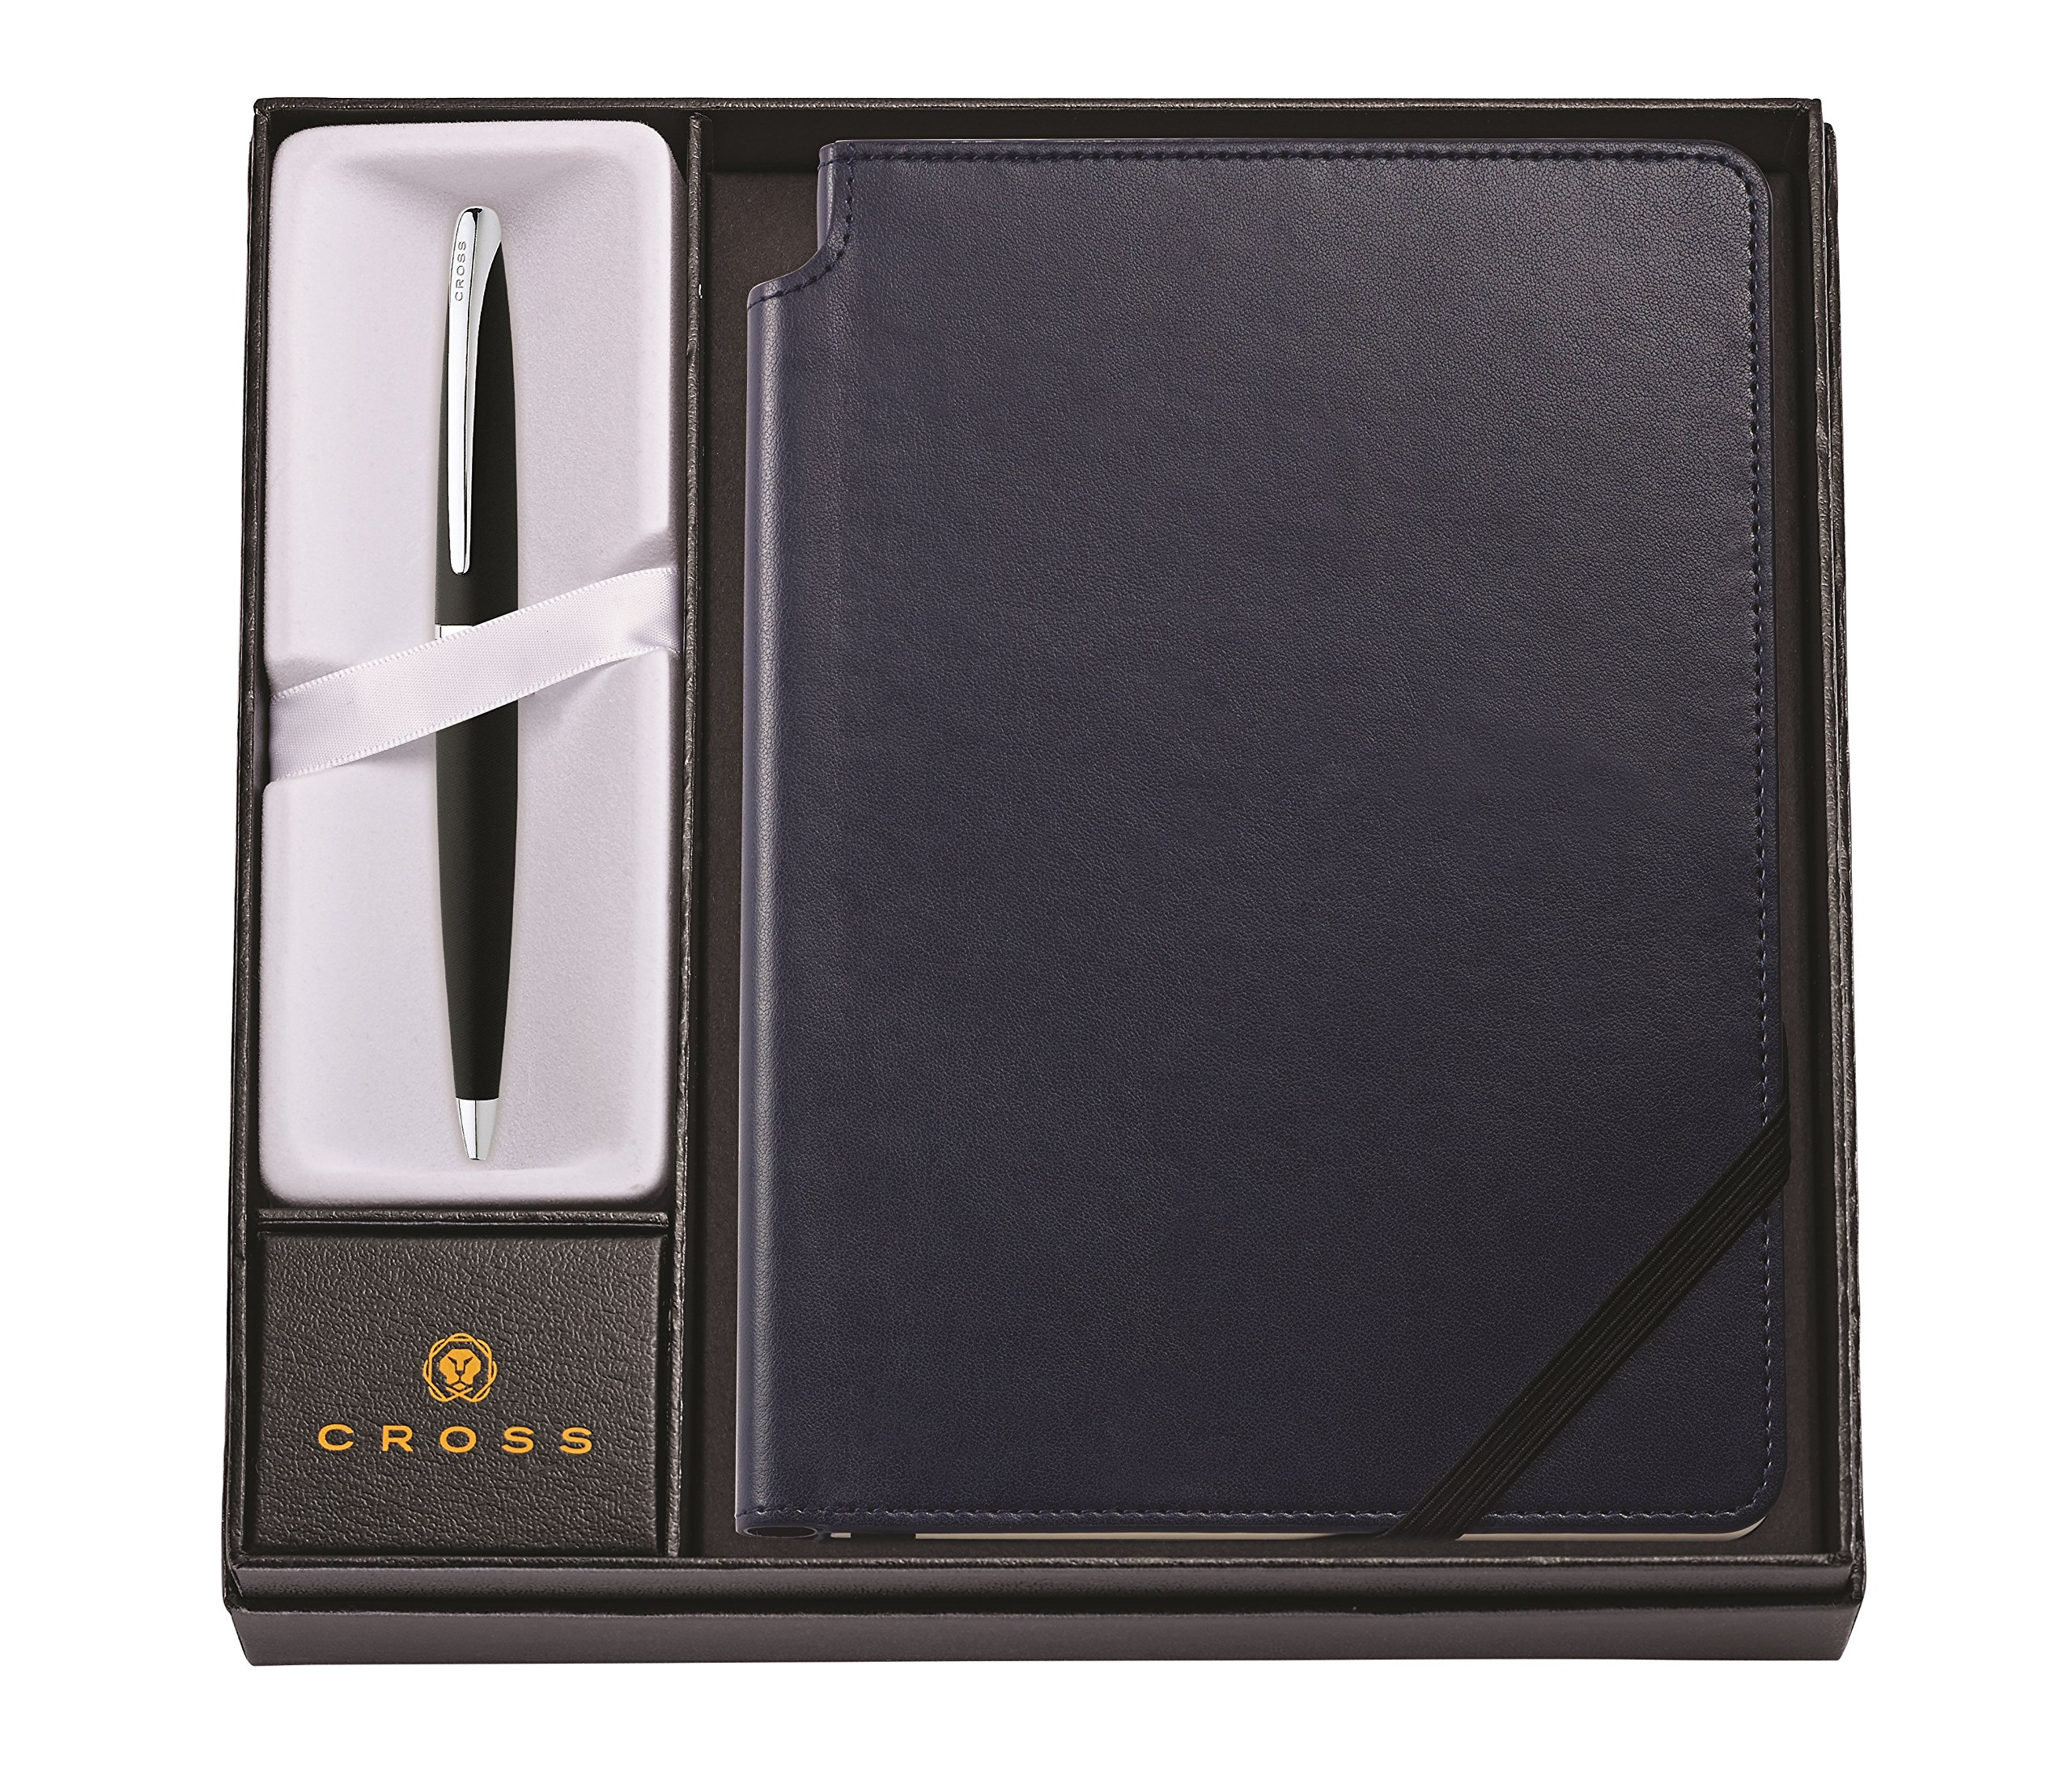 Cross ATX Basalt Black Ballpoint Pen & Midnight Blue Medium Journal